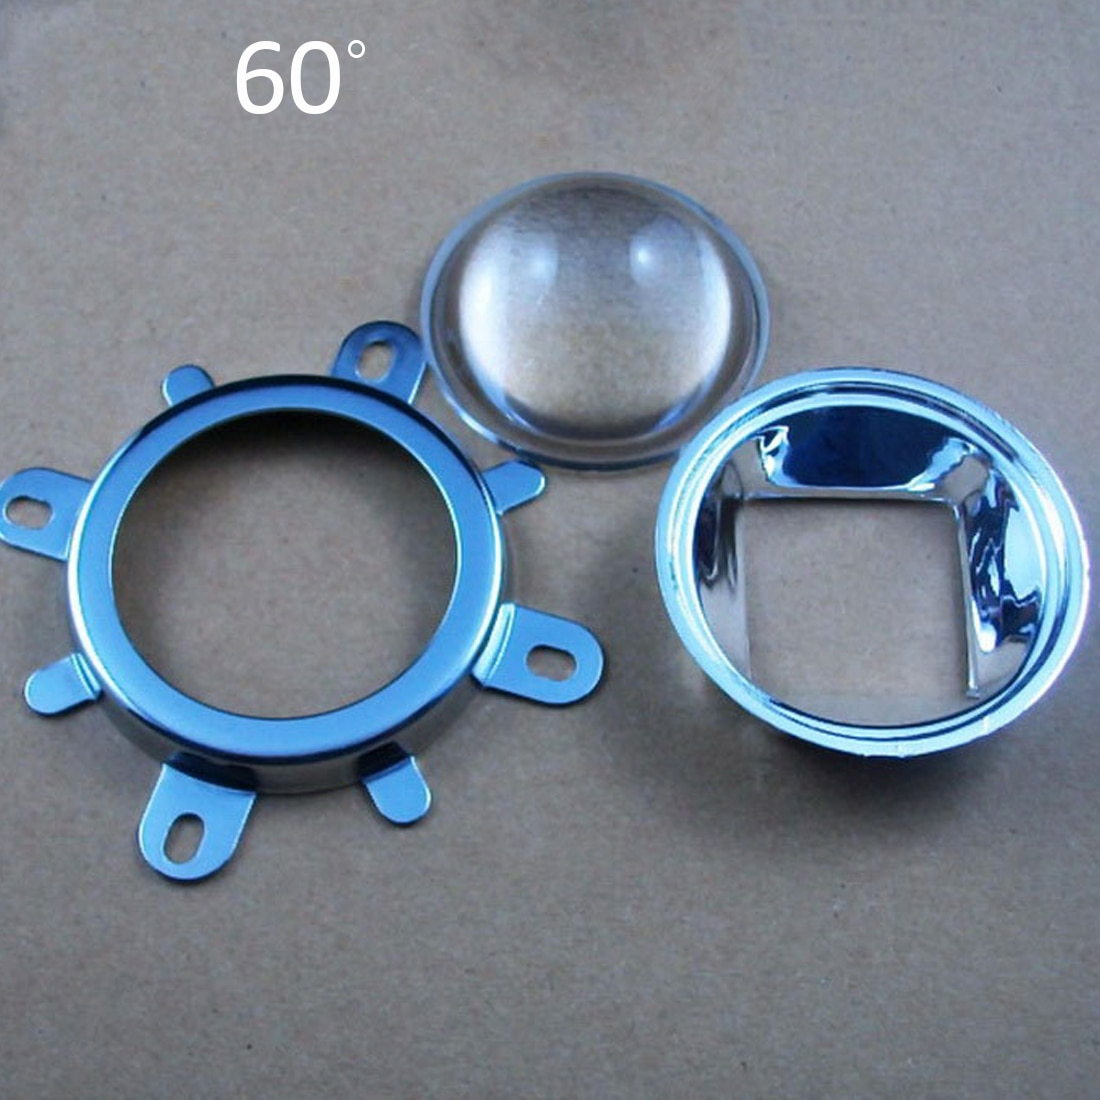 1 Juego de lente LED de 20W 30W 50W 70W 100W 120W 44mm + colimador reflector de 50mm + soporte fijo